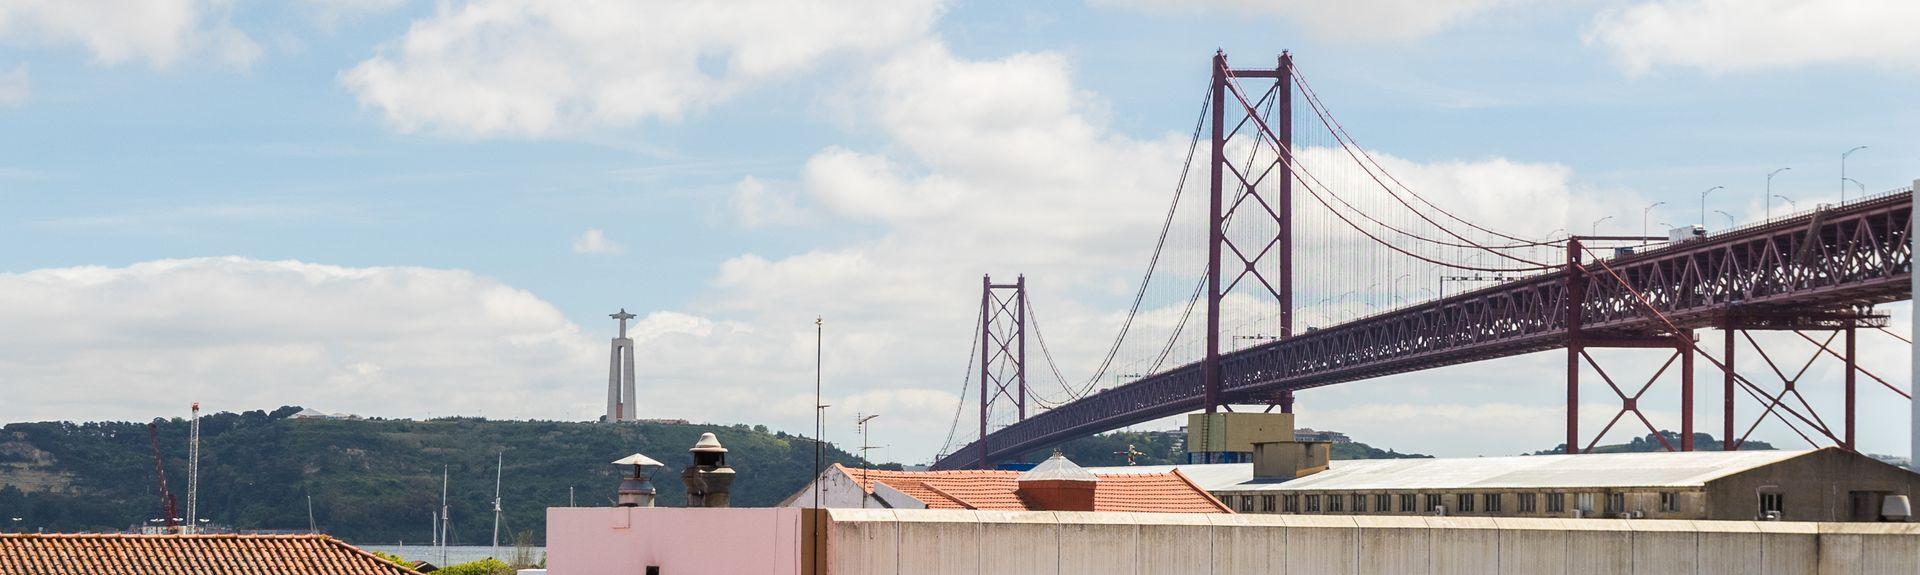 Santo Condestável, Distrito de Lisboa, Portugal